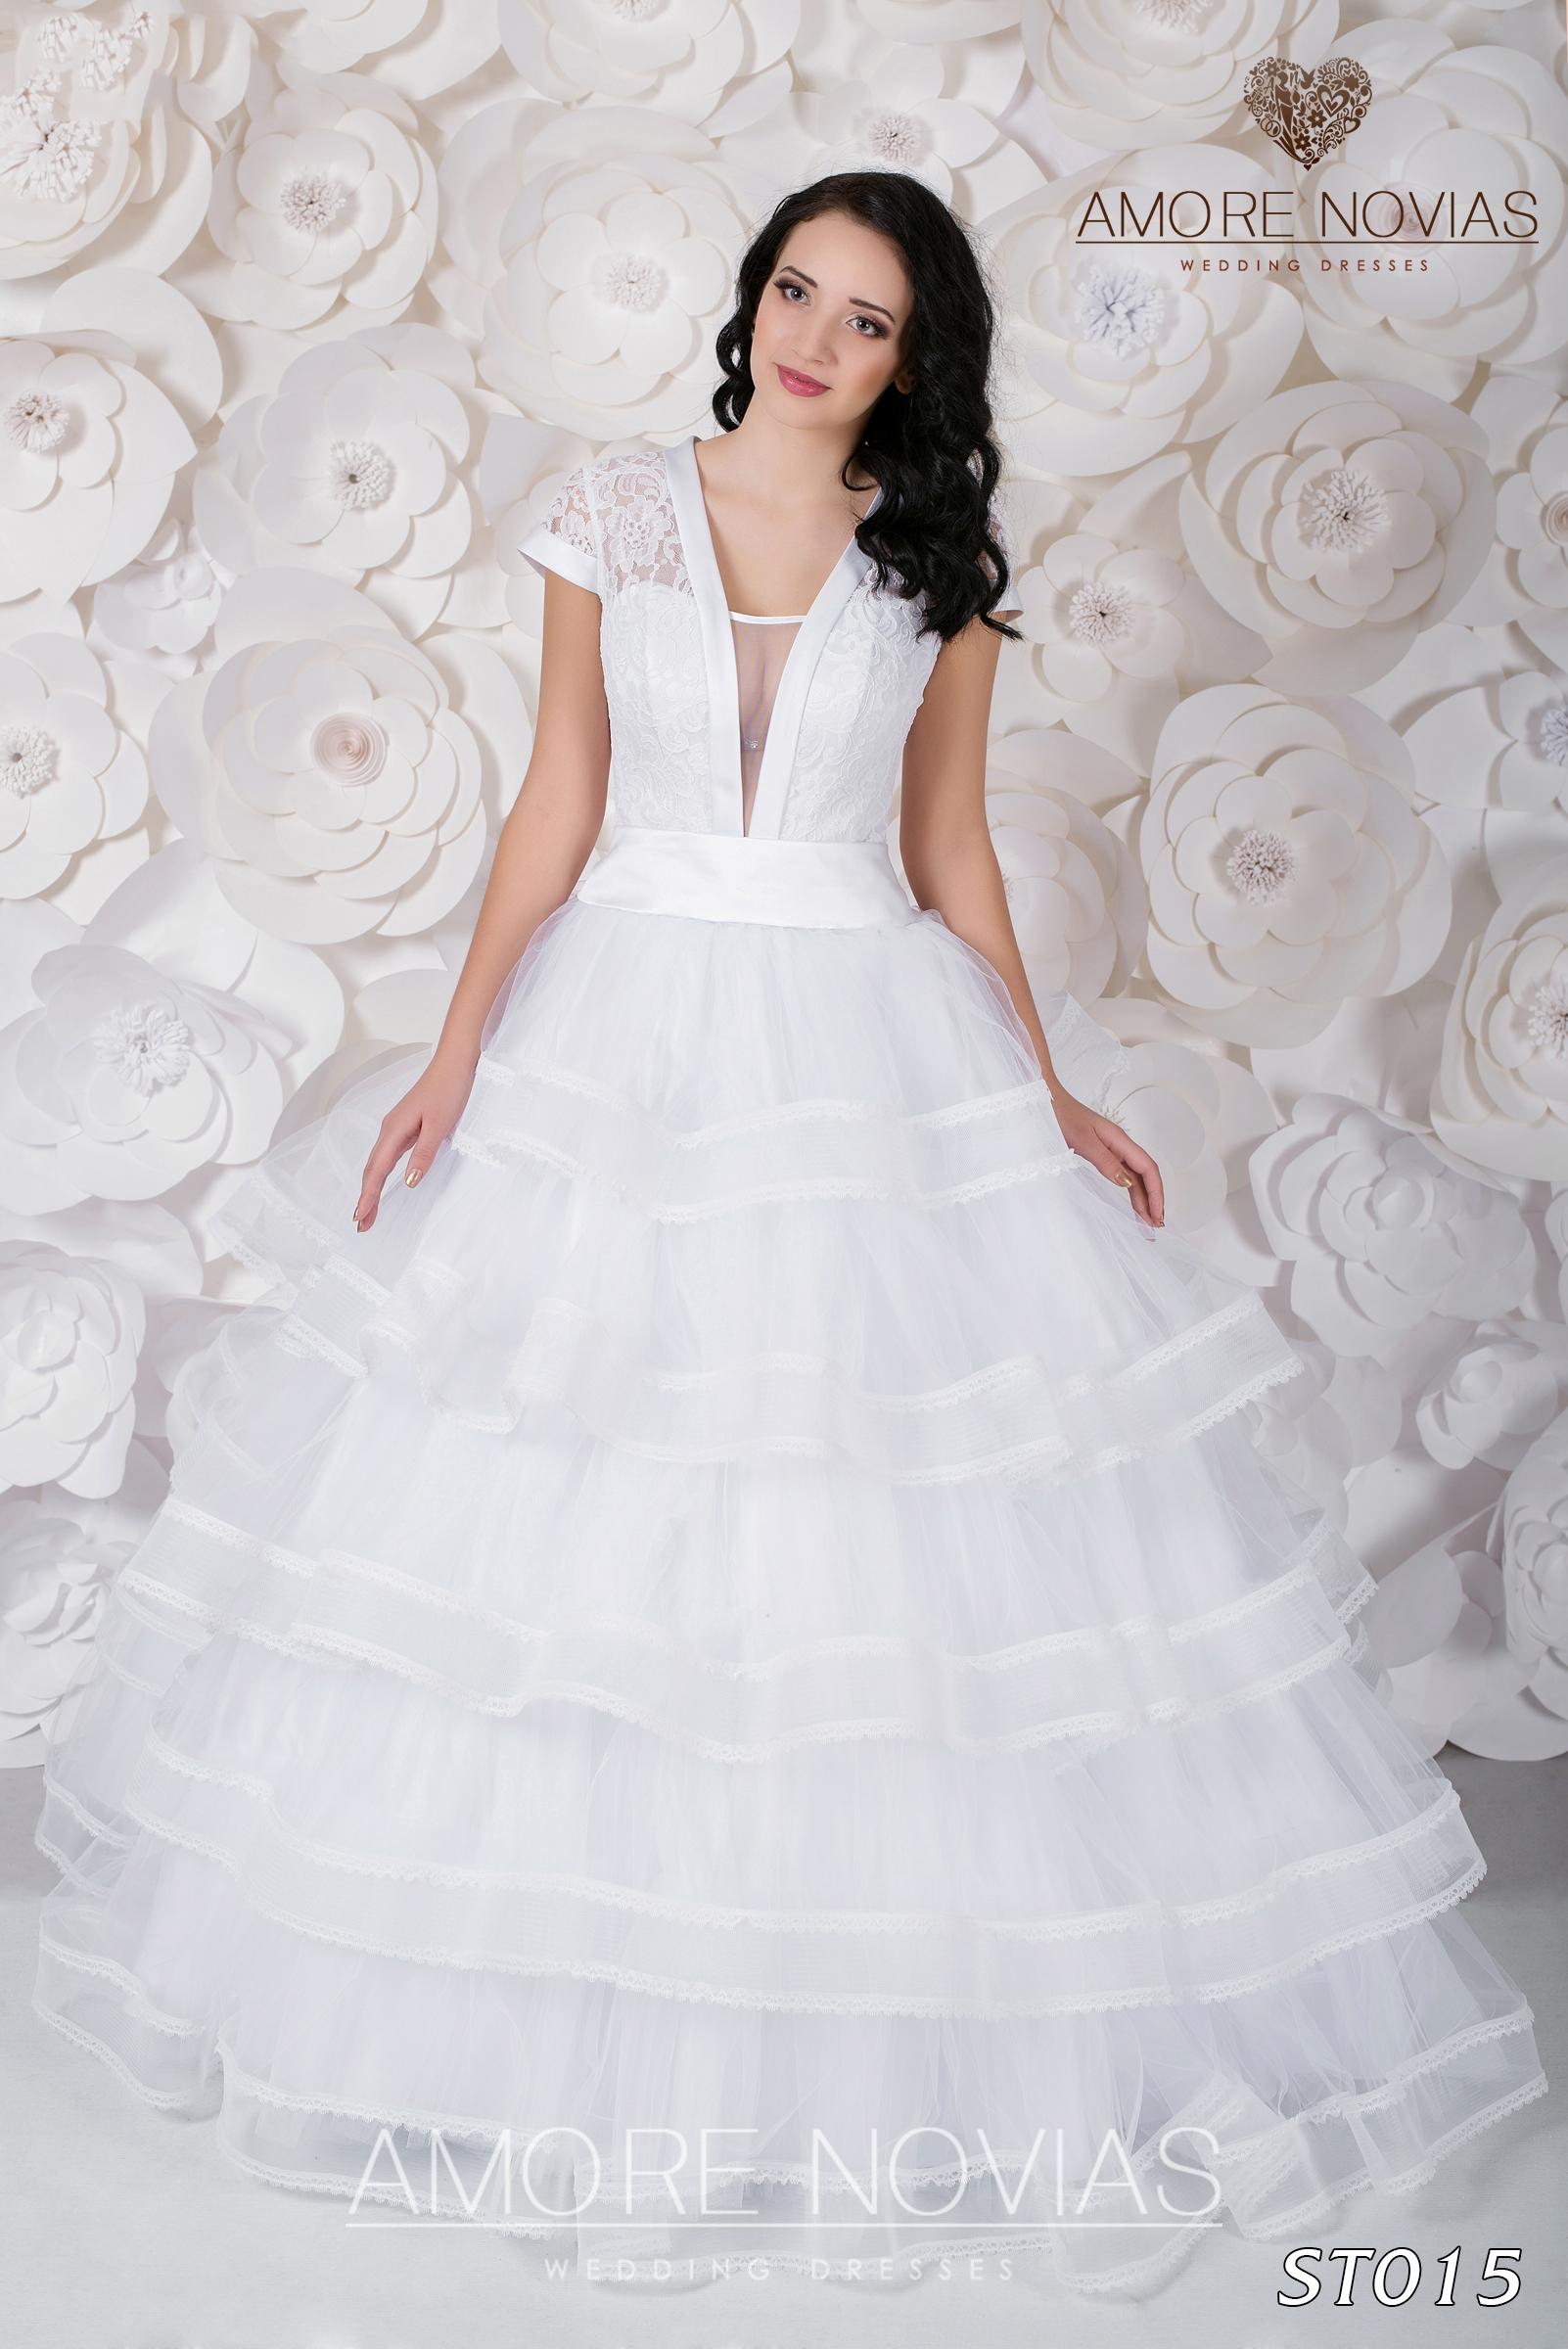 http://amore-novias.com/images/stories/virtuemart/product/st015.jpg